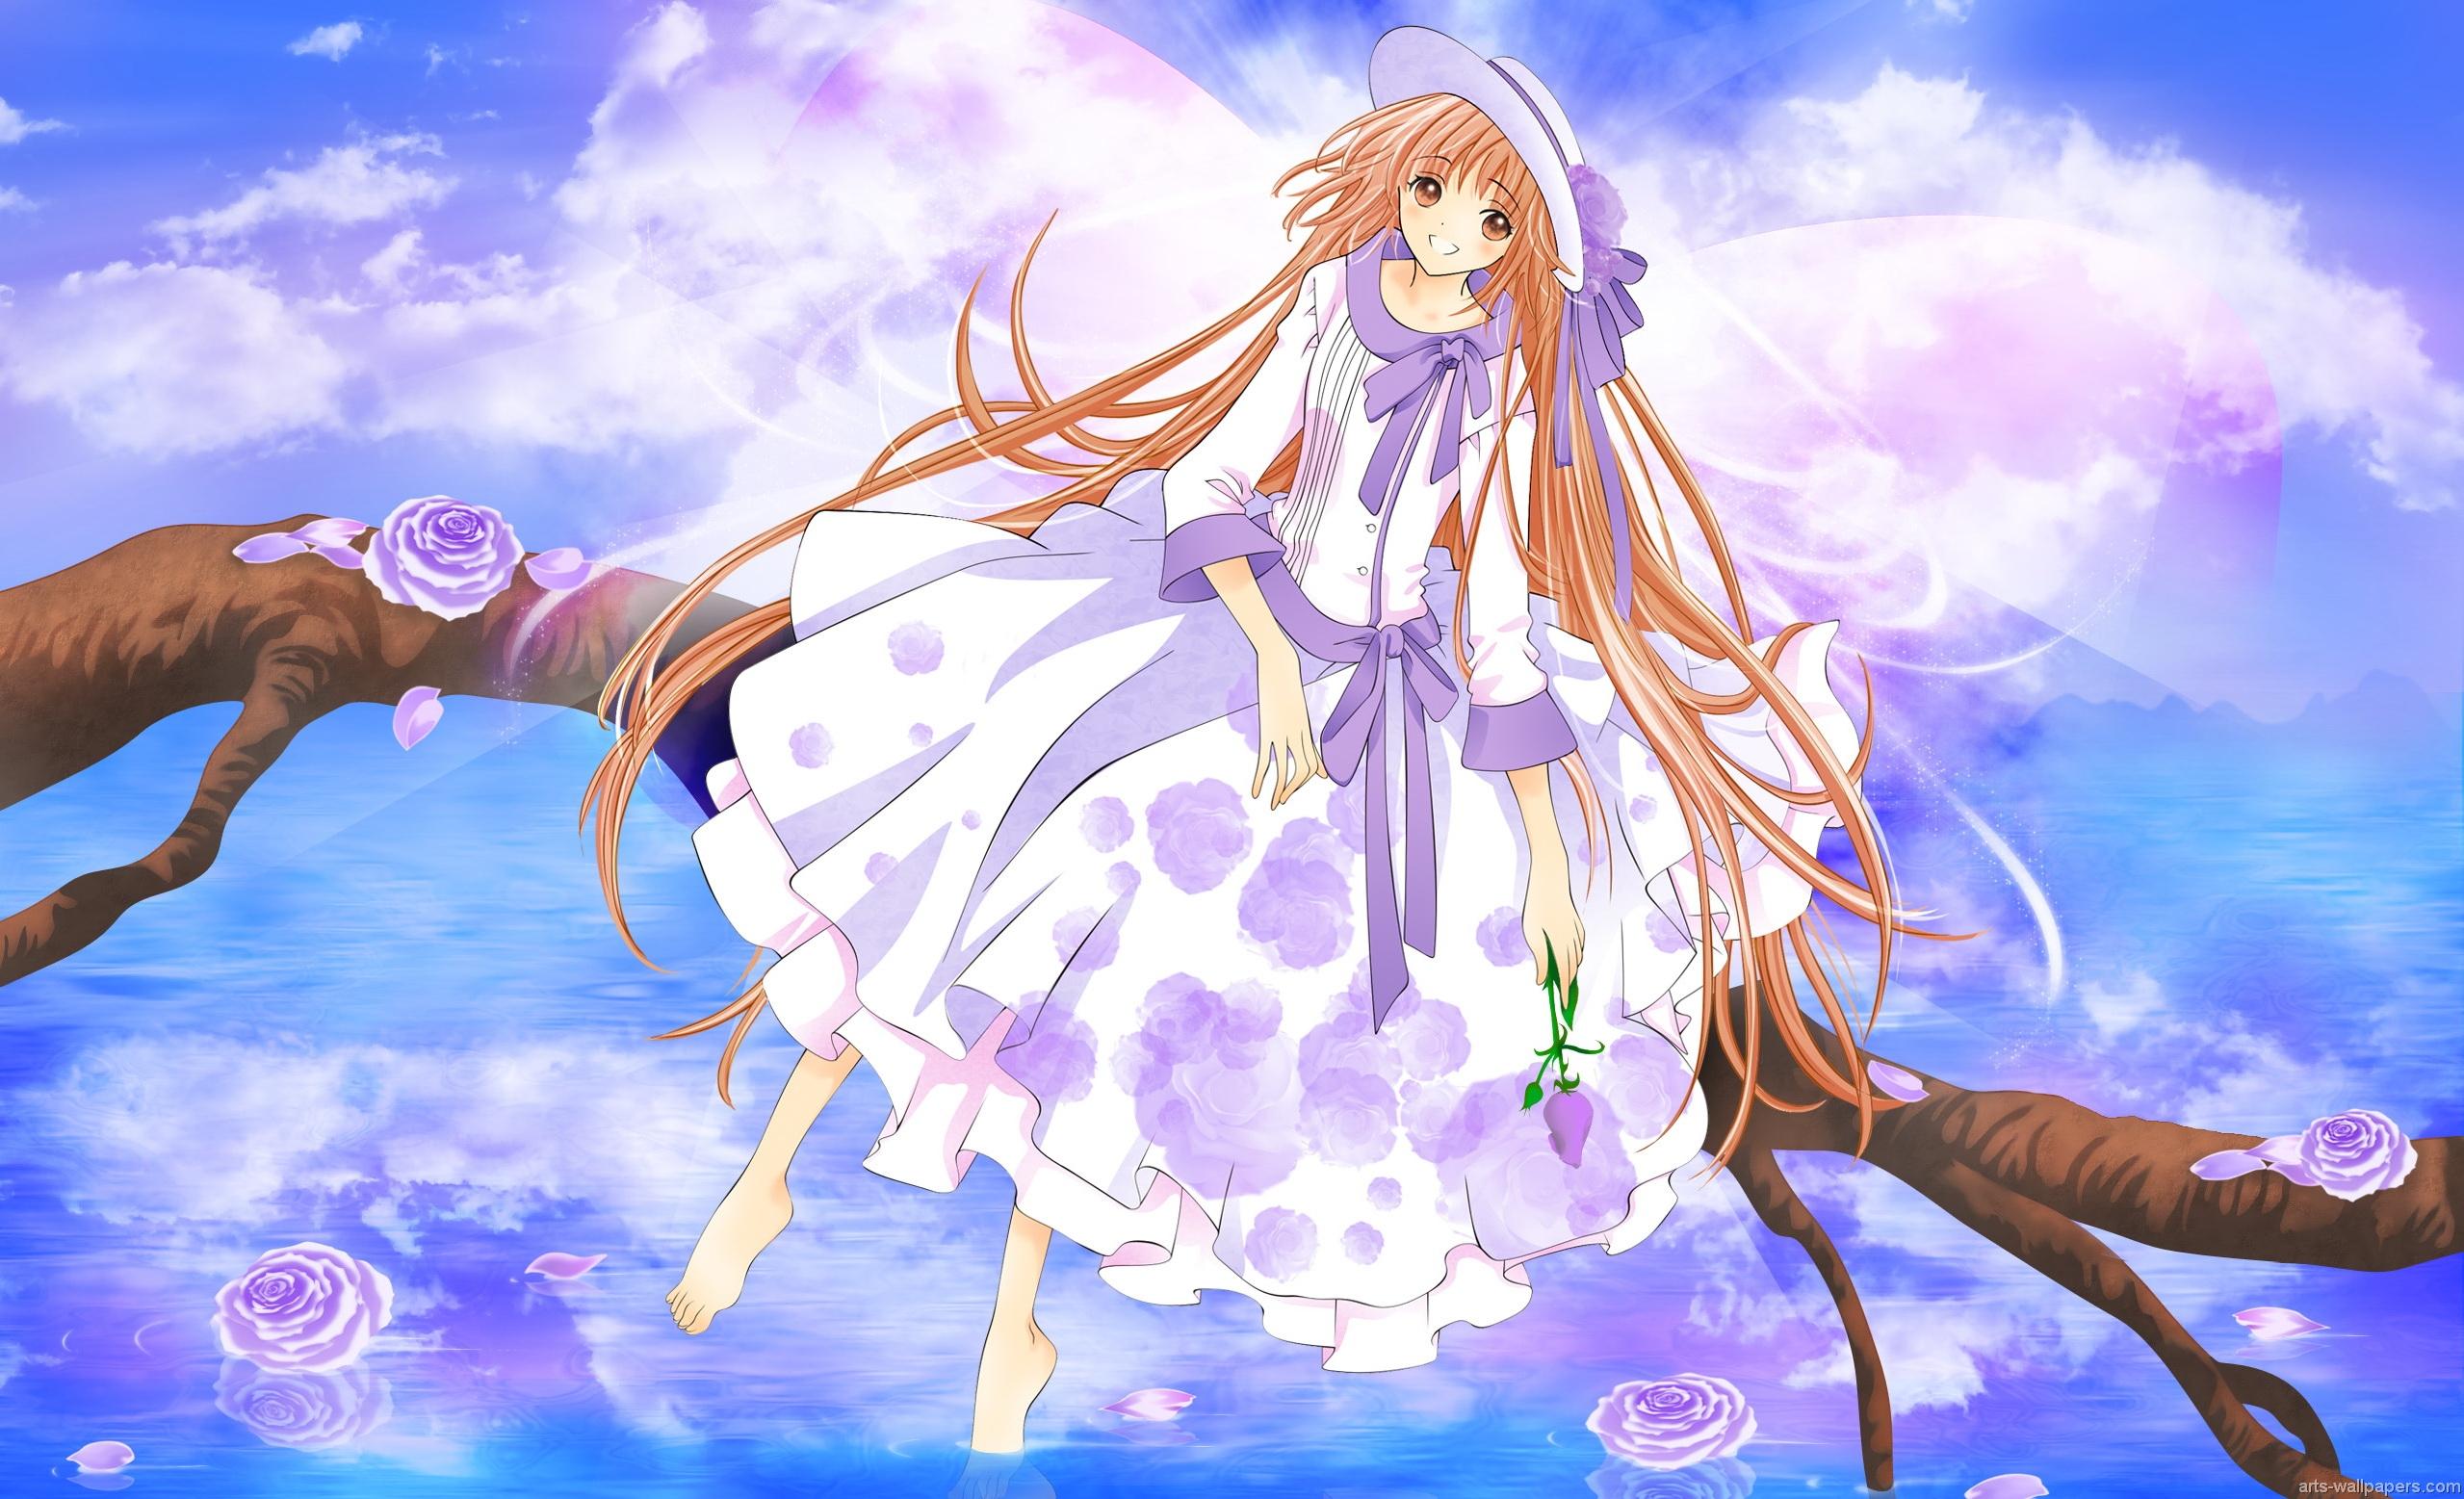 49+ Japanese Anime Wallpapers on WallpaperSafari